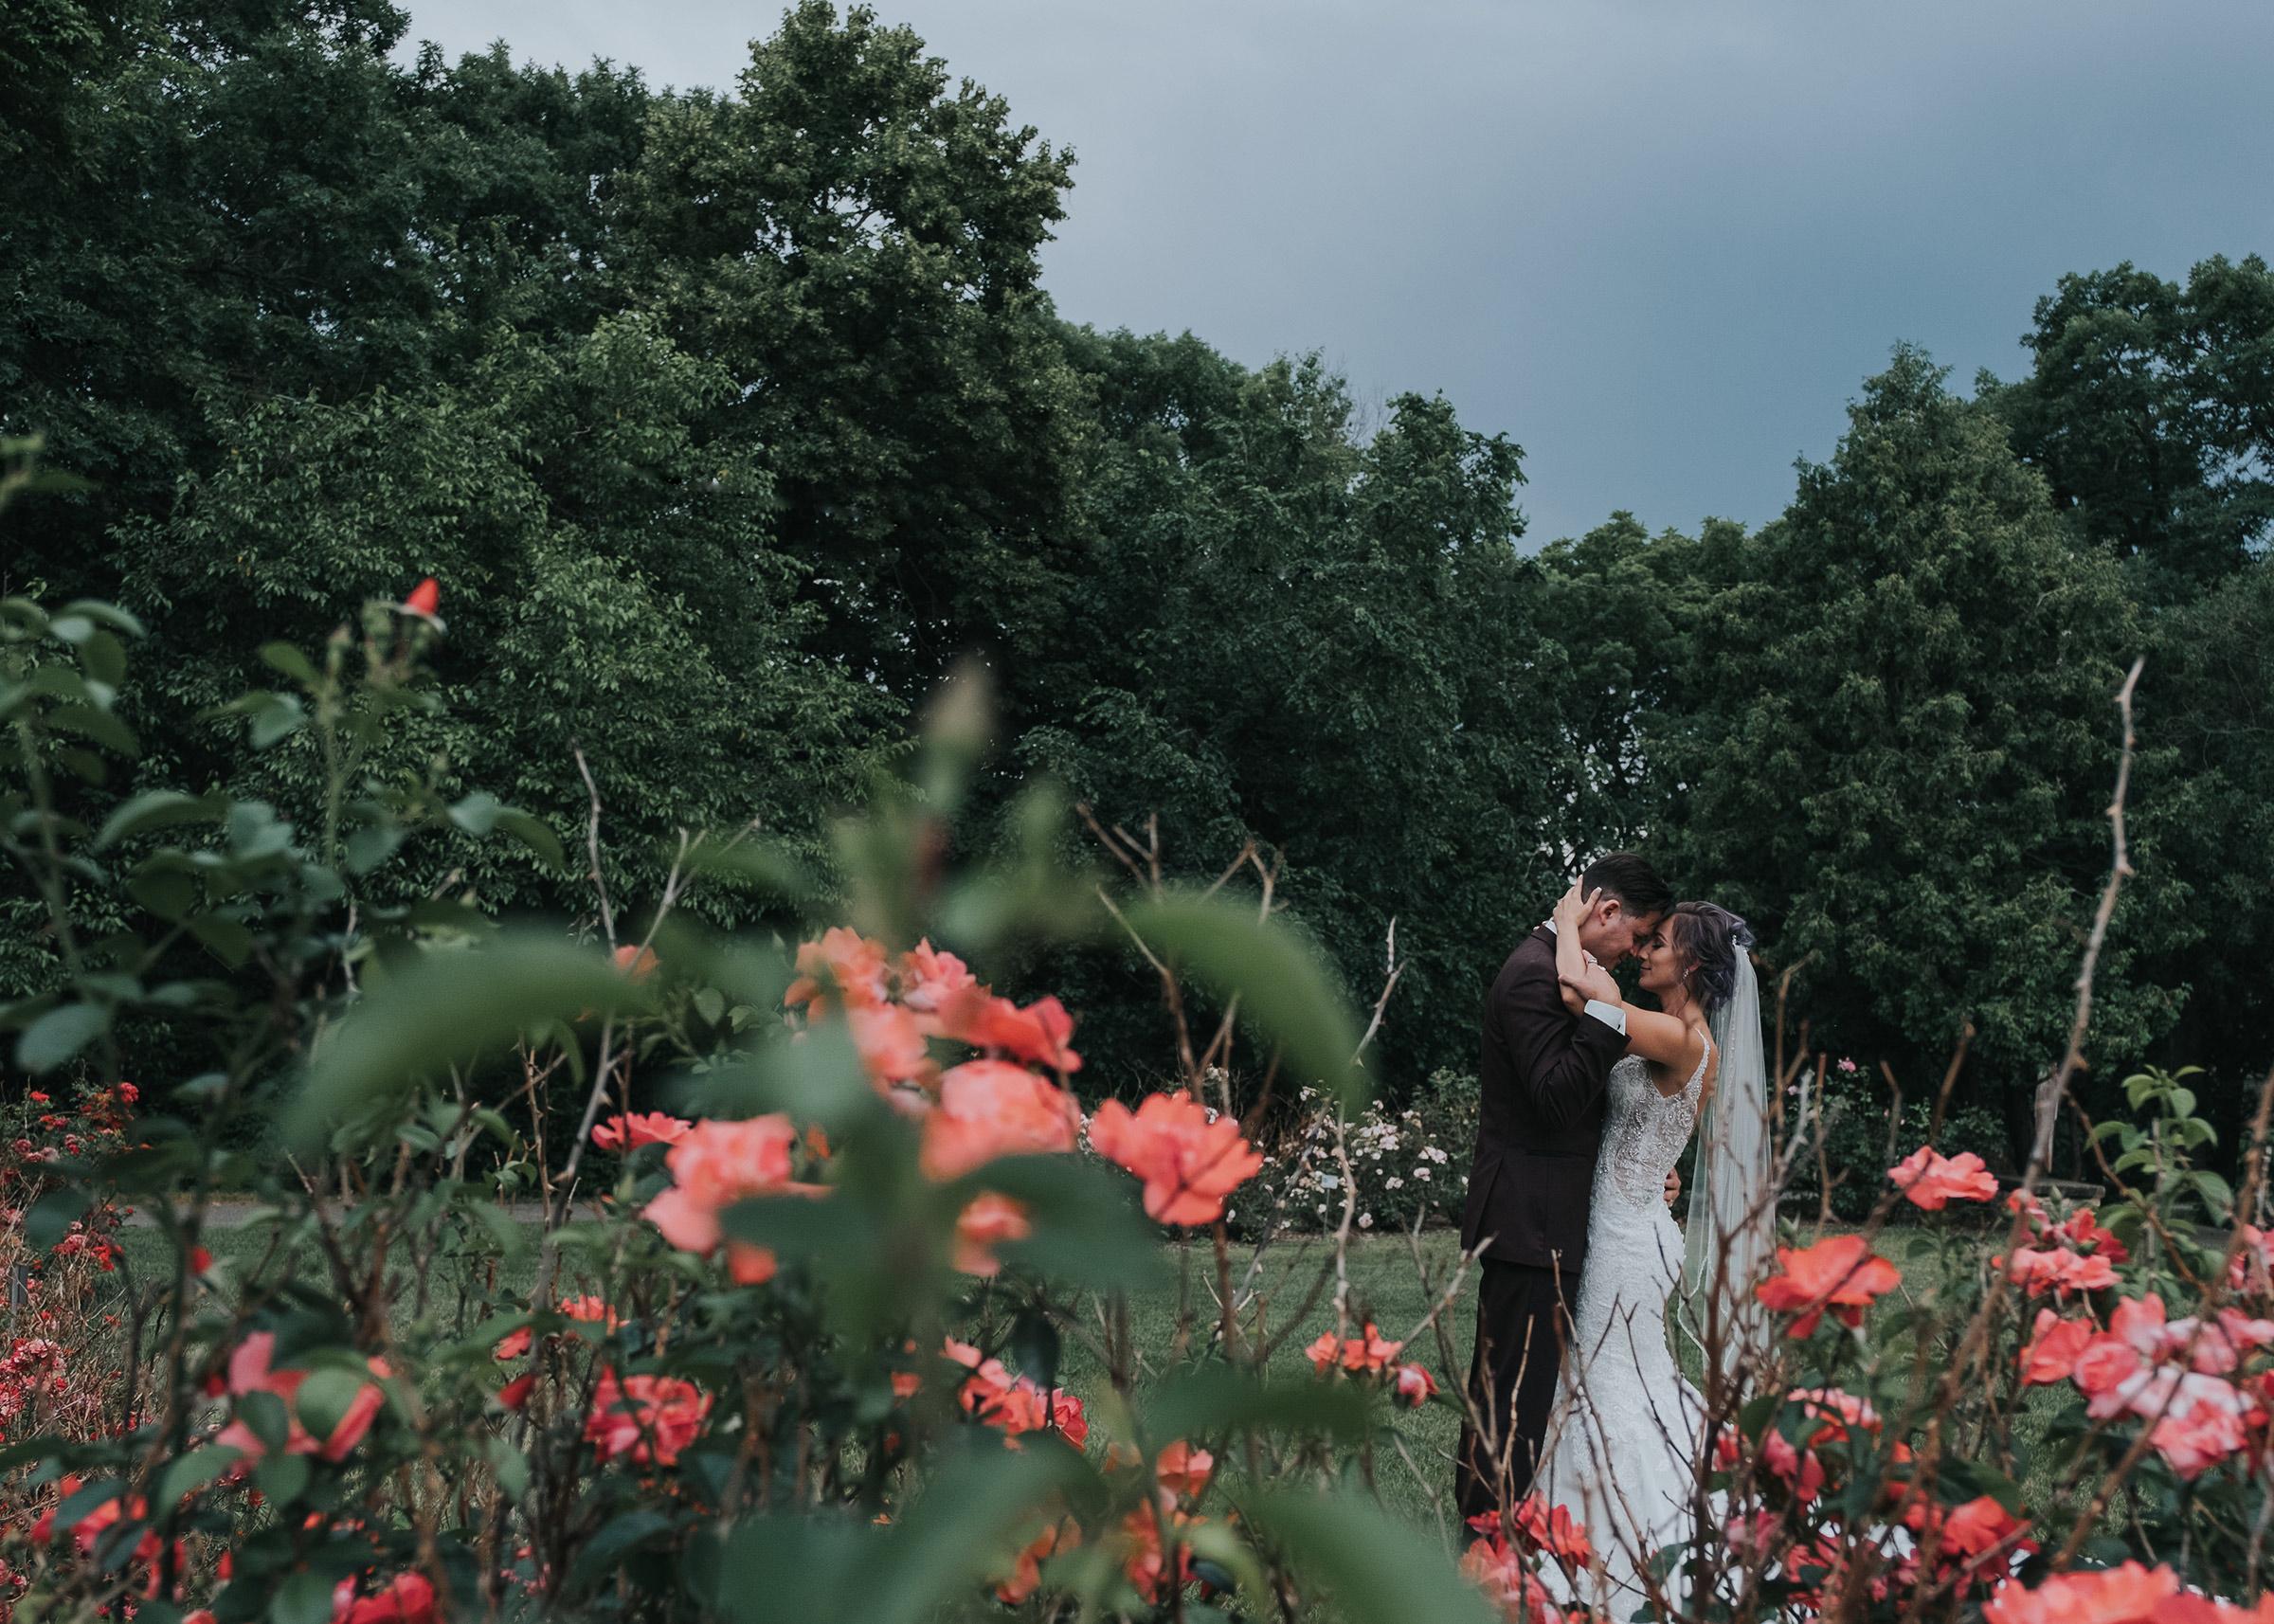 bride-groom-getting-close-in-rose-garden-desmoines-iowa-art-center-raelyn-ramey-photography.jpg